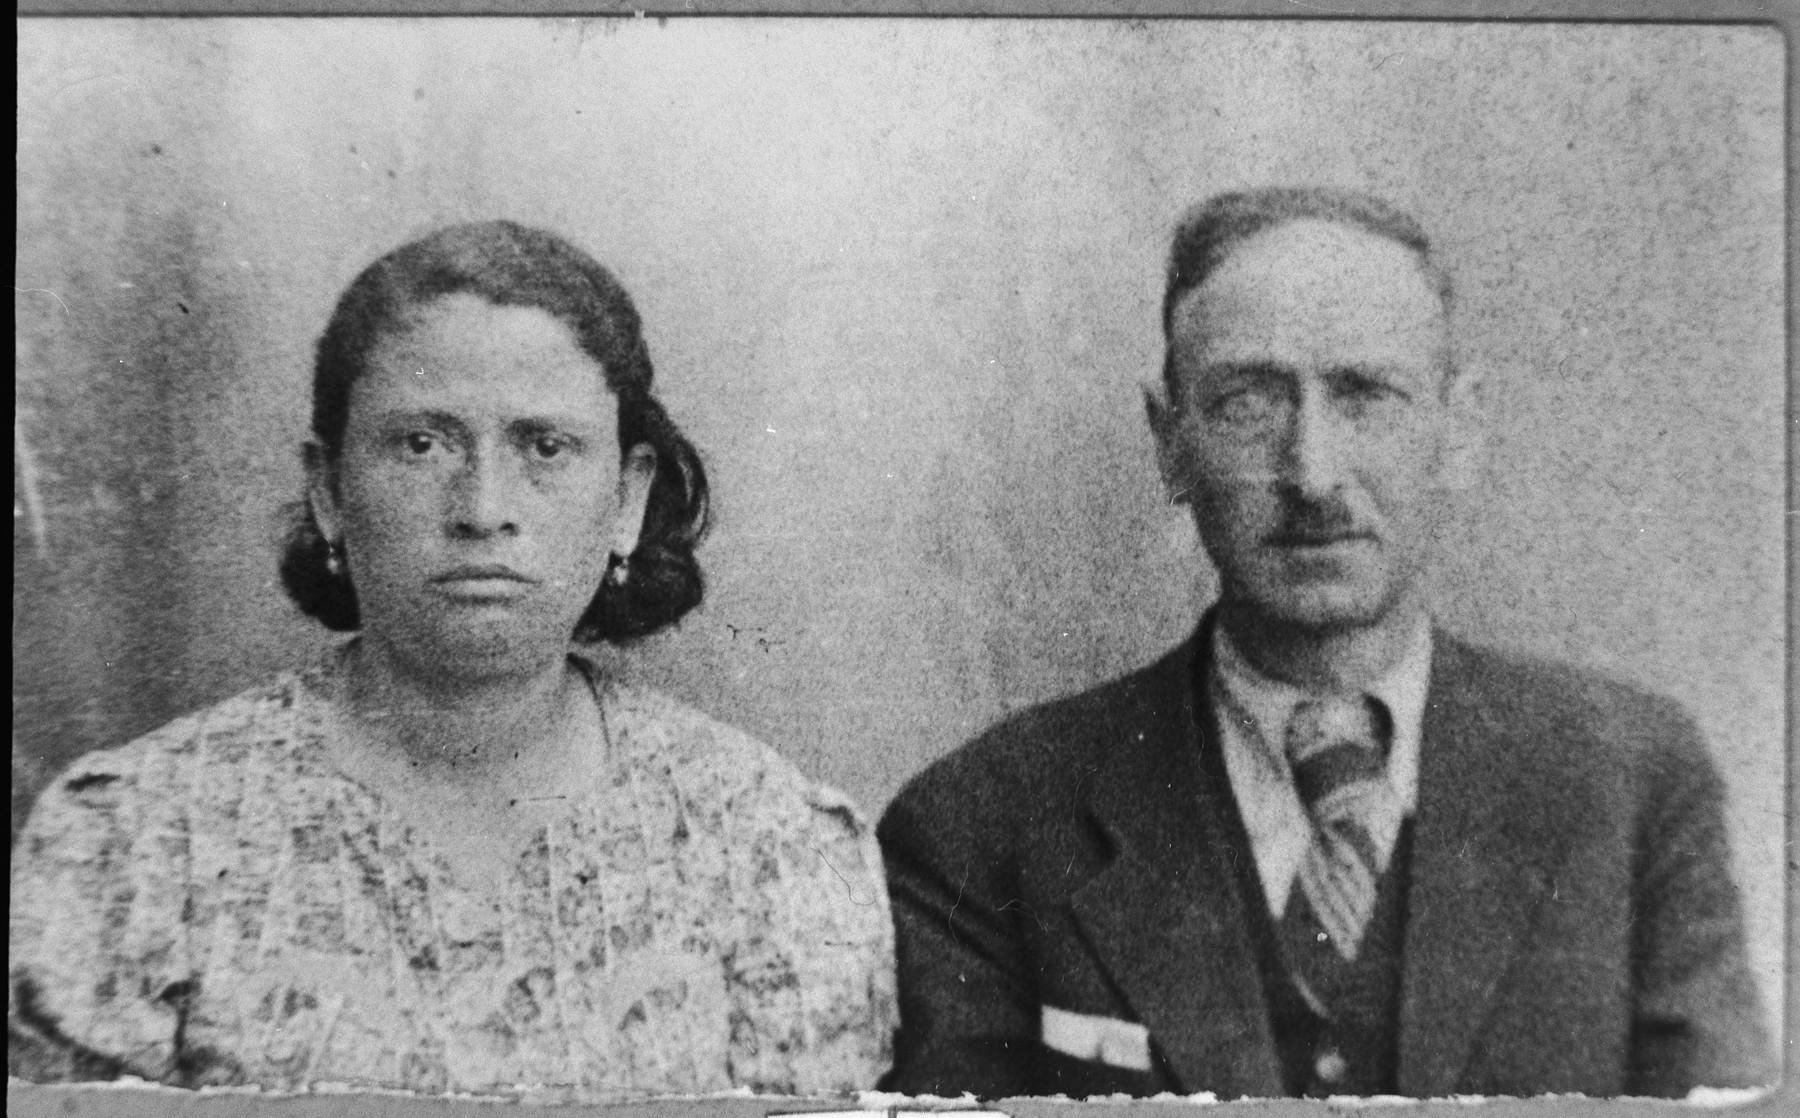 Portrait of Avram Albenda, son of Pinchas Albenda, and his wife, Rebeka.  Avram was a glazier.  They lived at Sremska 12 in Bitola.